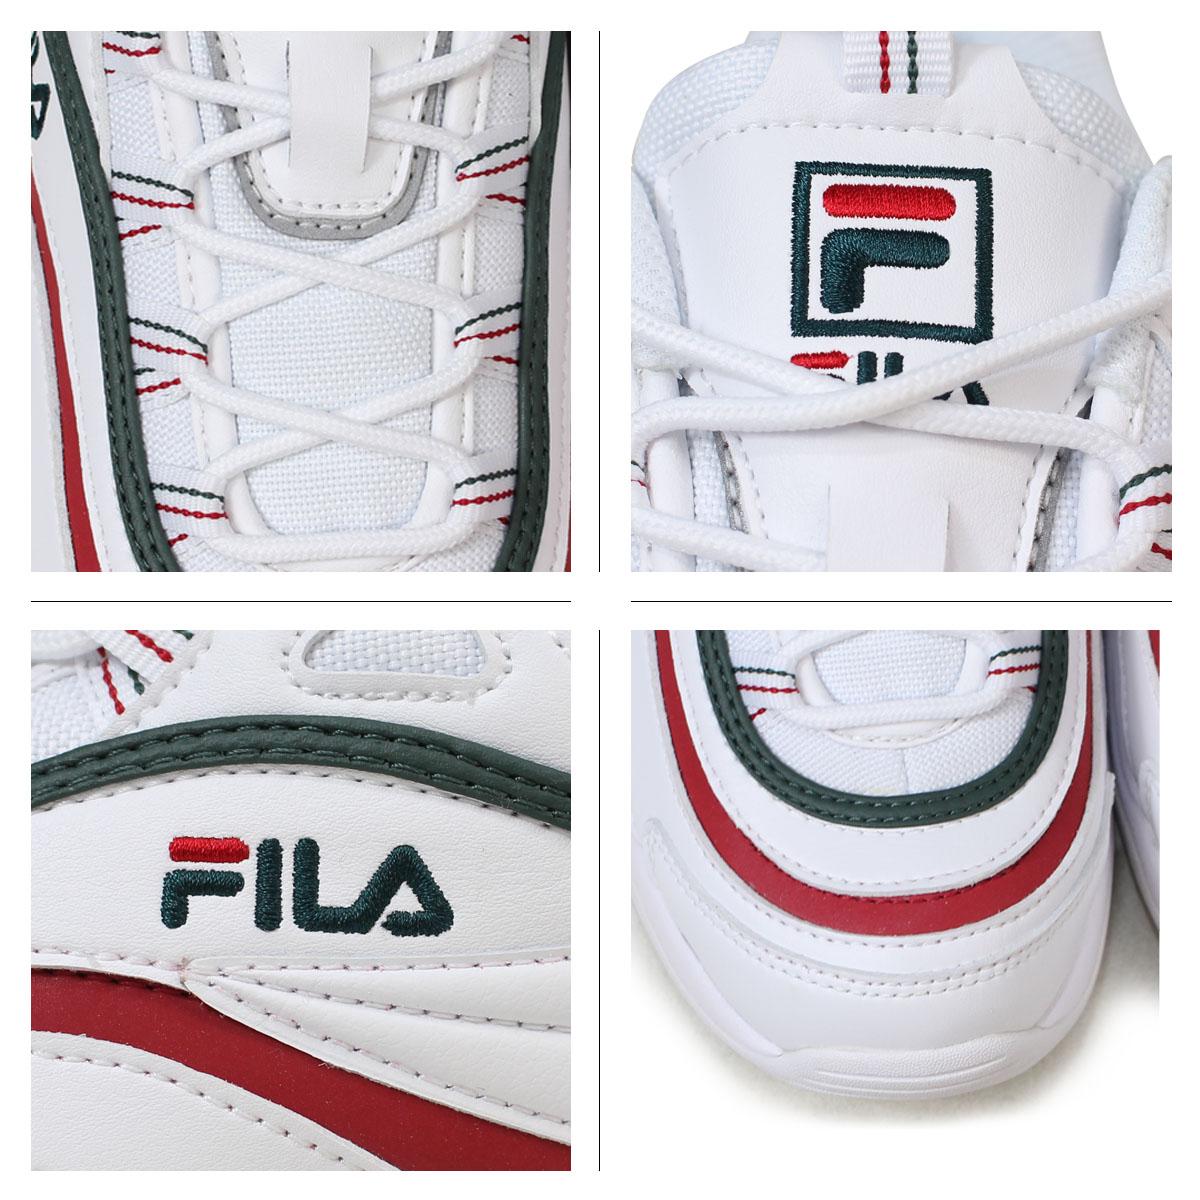 Fila FILA Fila lei sneakers men gap Dis folder FOLDER FILARAY SMU collaboration white white FLFL8A1U10 FS1SIA1166X WGN